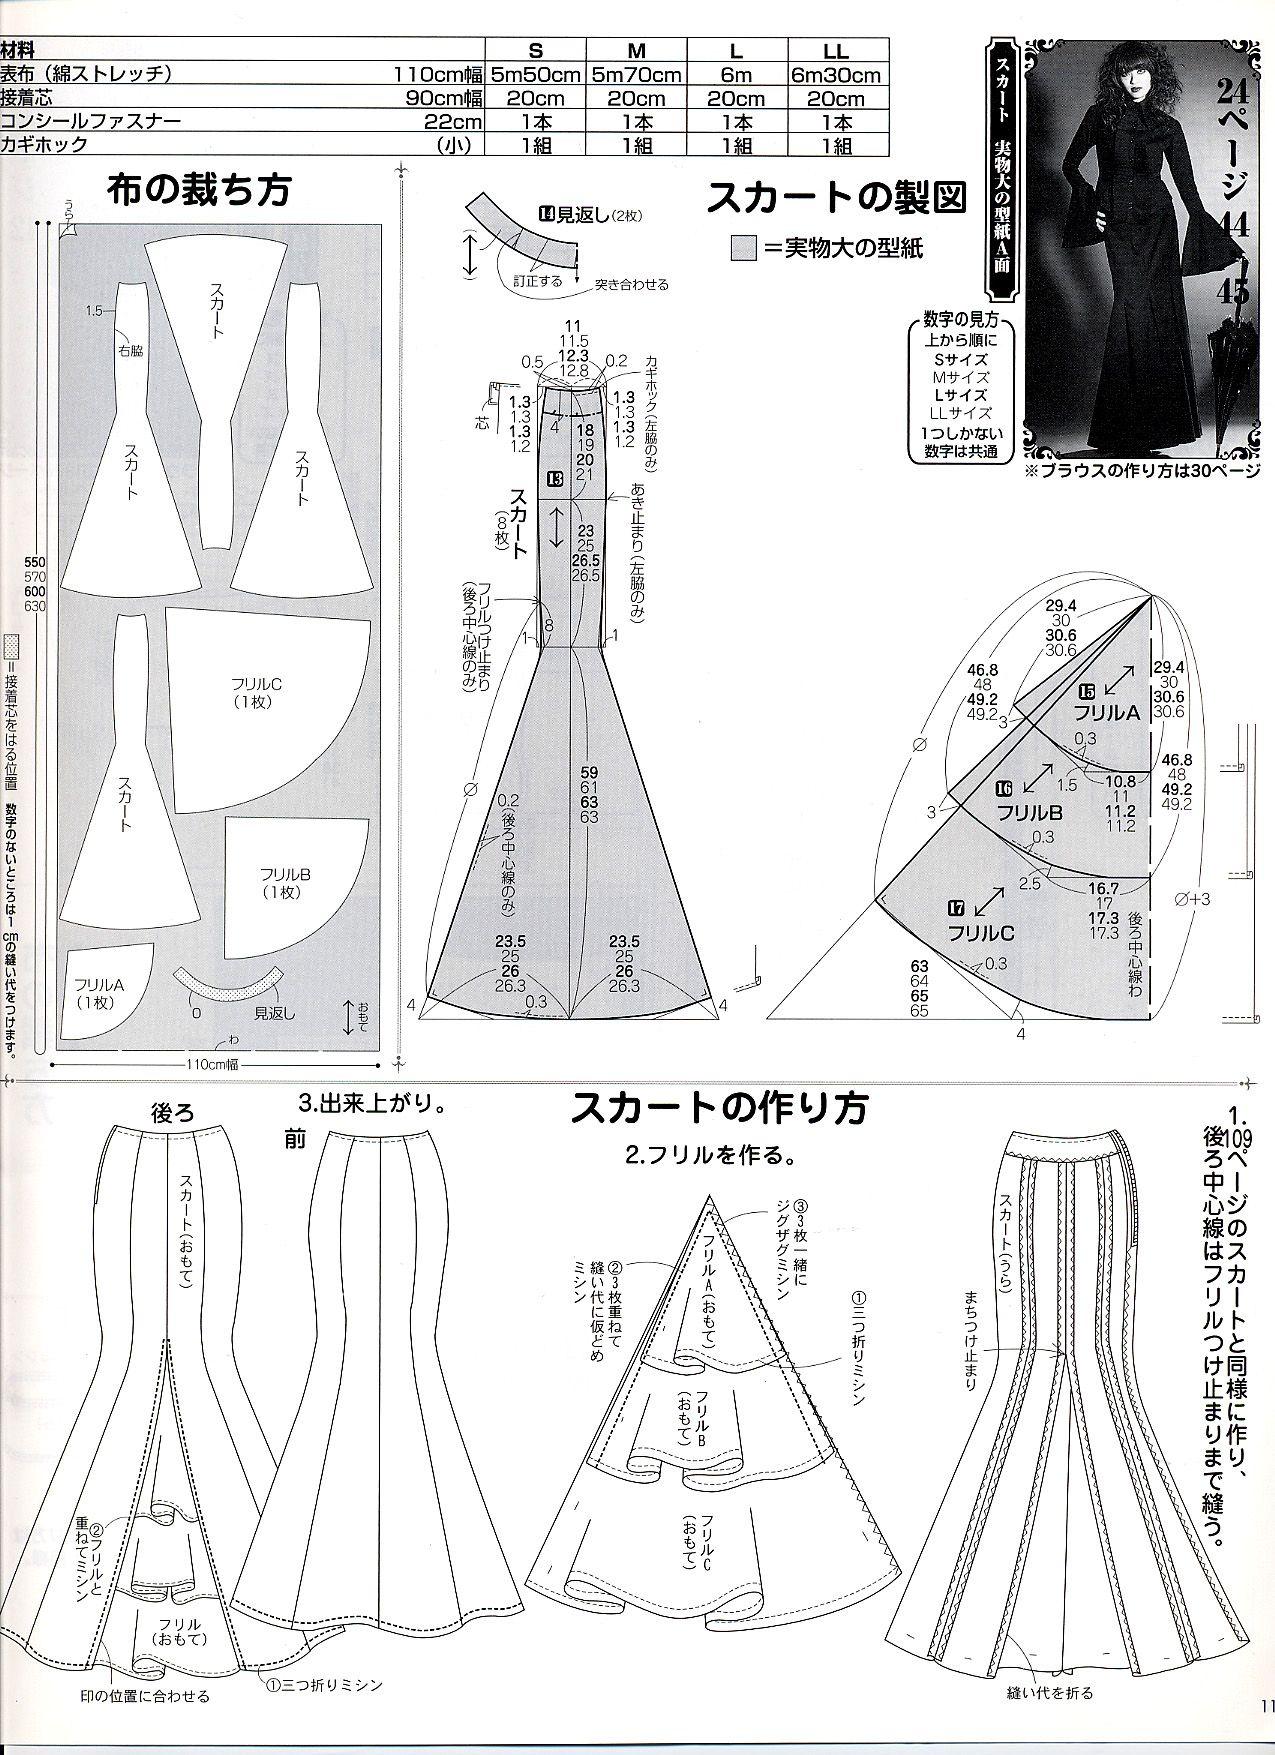 Mermaid Skirt Pattern : mermaid, skirt, pattern, Mermaid, Pattern, (Japanese), Dress, Pattern,, Skirt